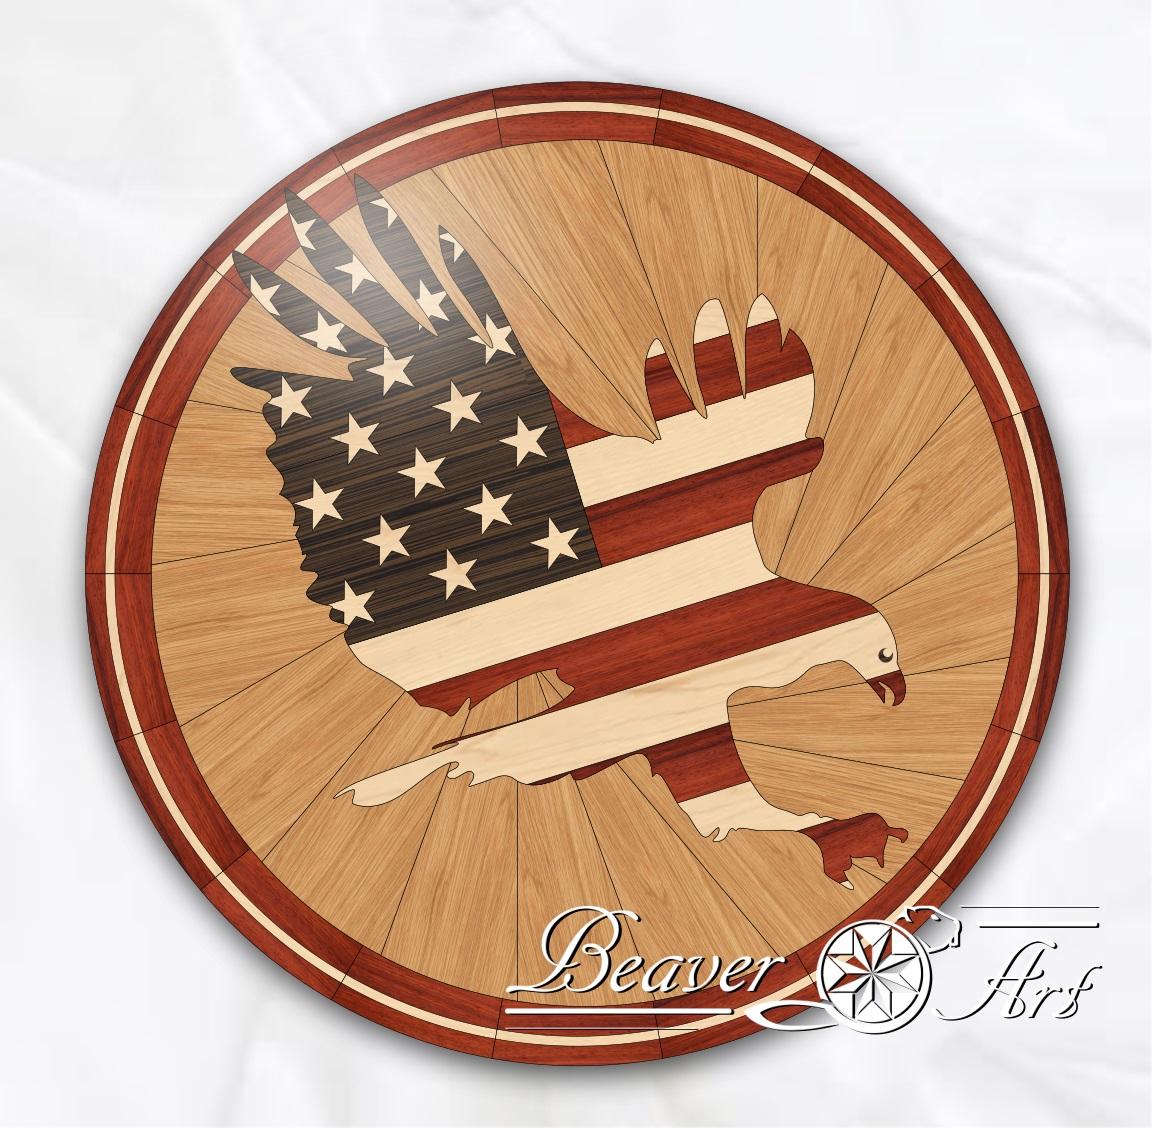 American flag with eagle, used woods: wenge, maple, oak and padauk